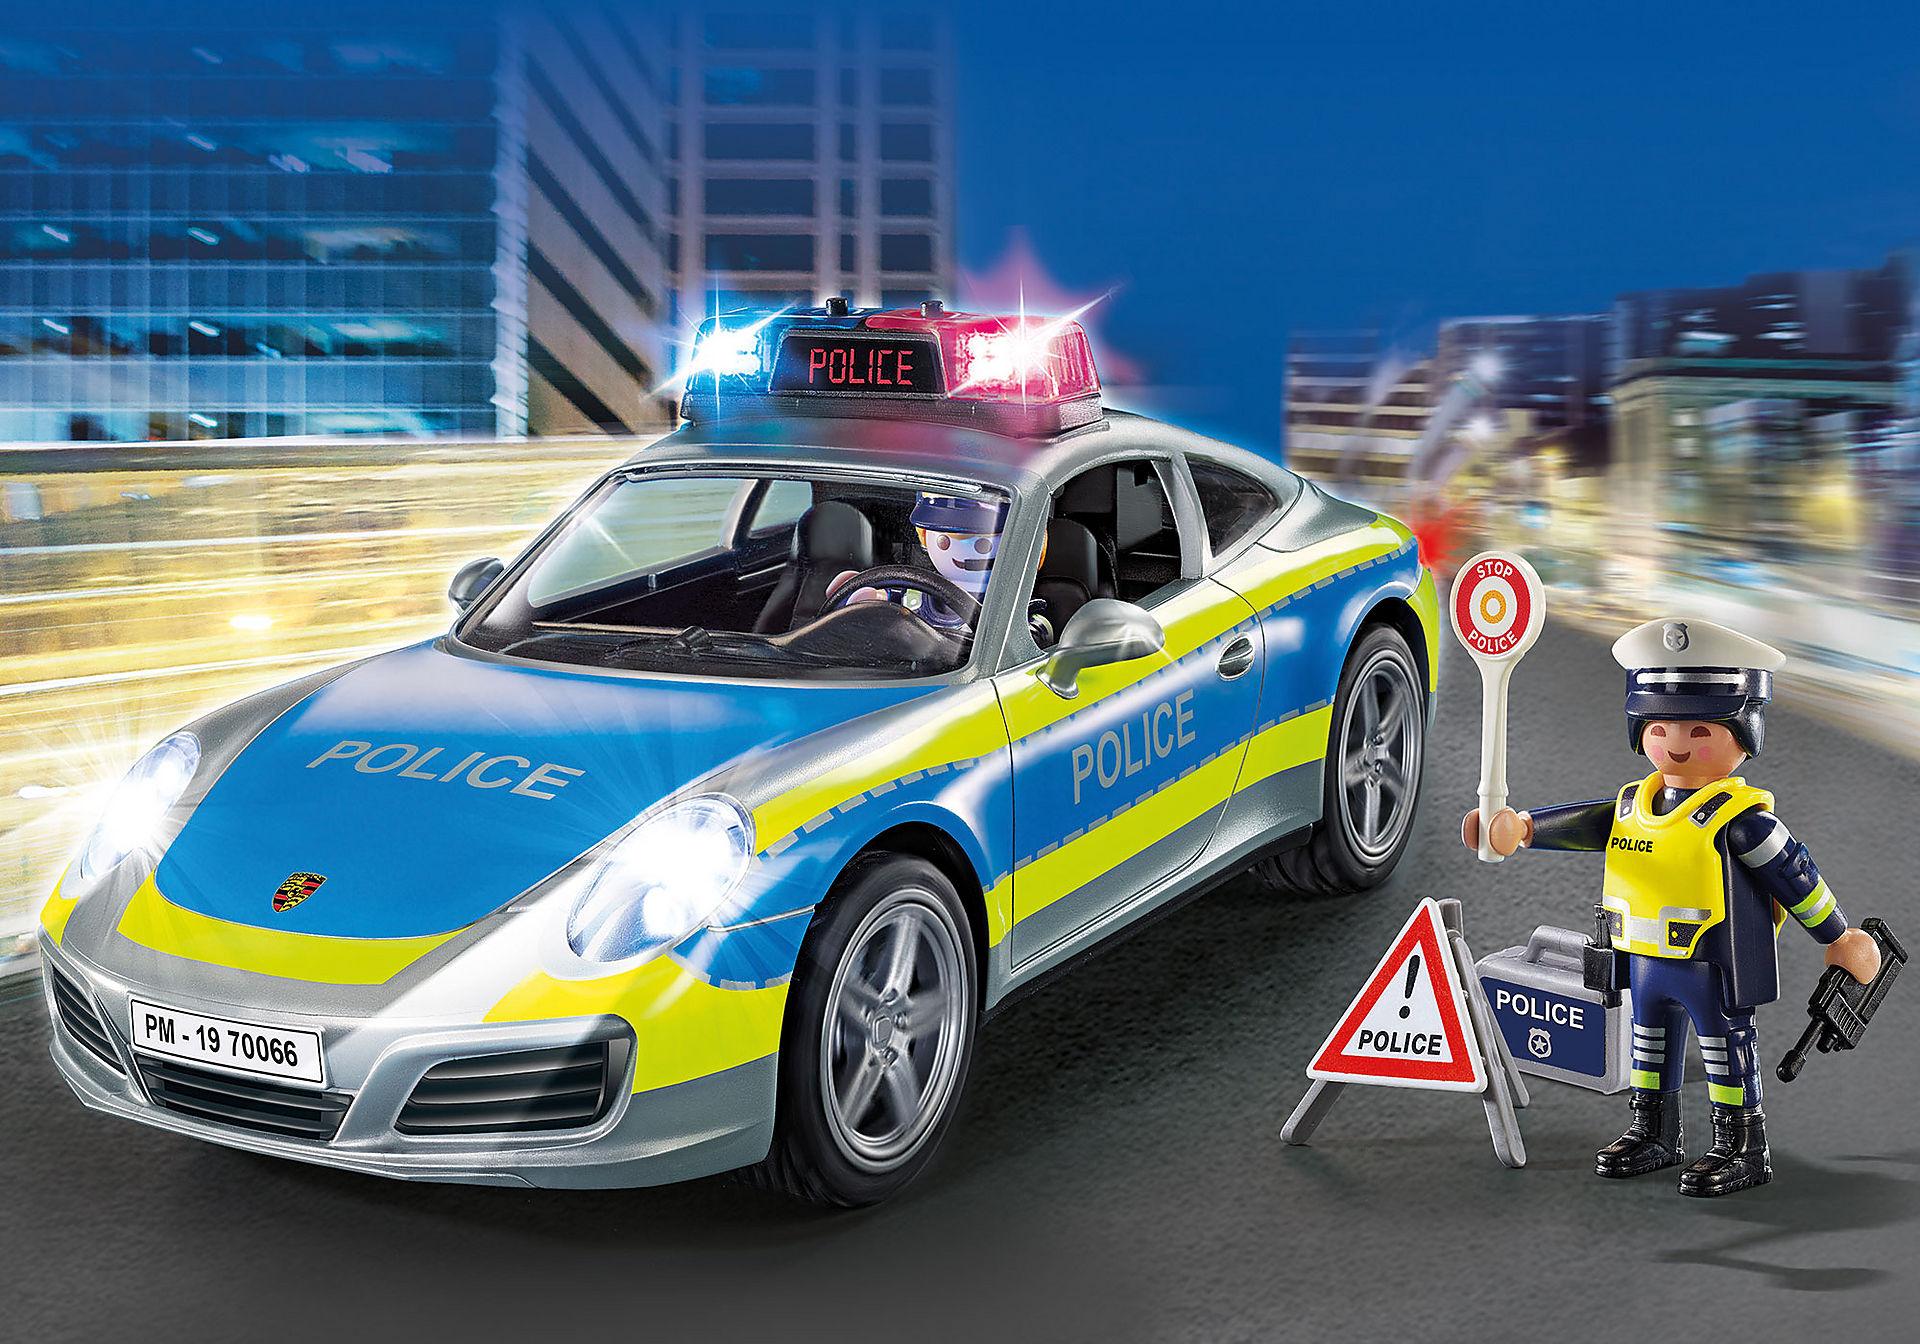 70066 Porsche 911 Carrera 4S Αστυνομικό όχημα zoom image1